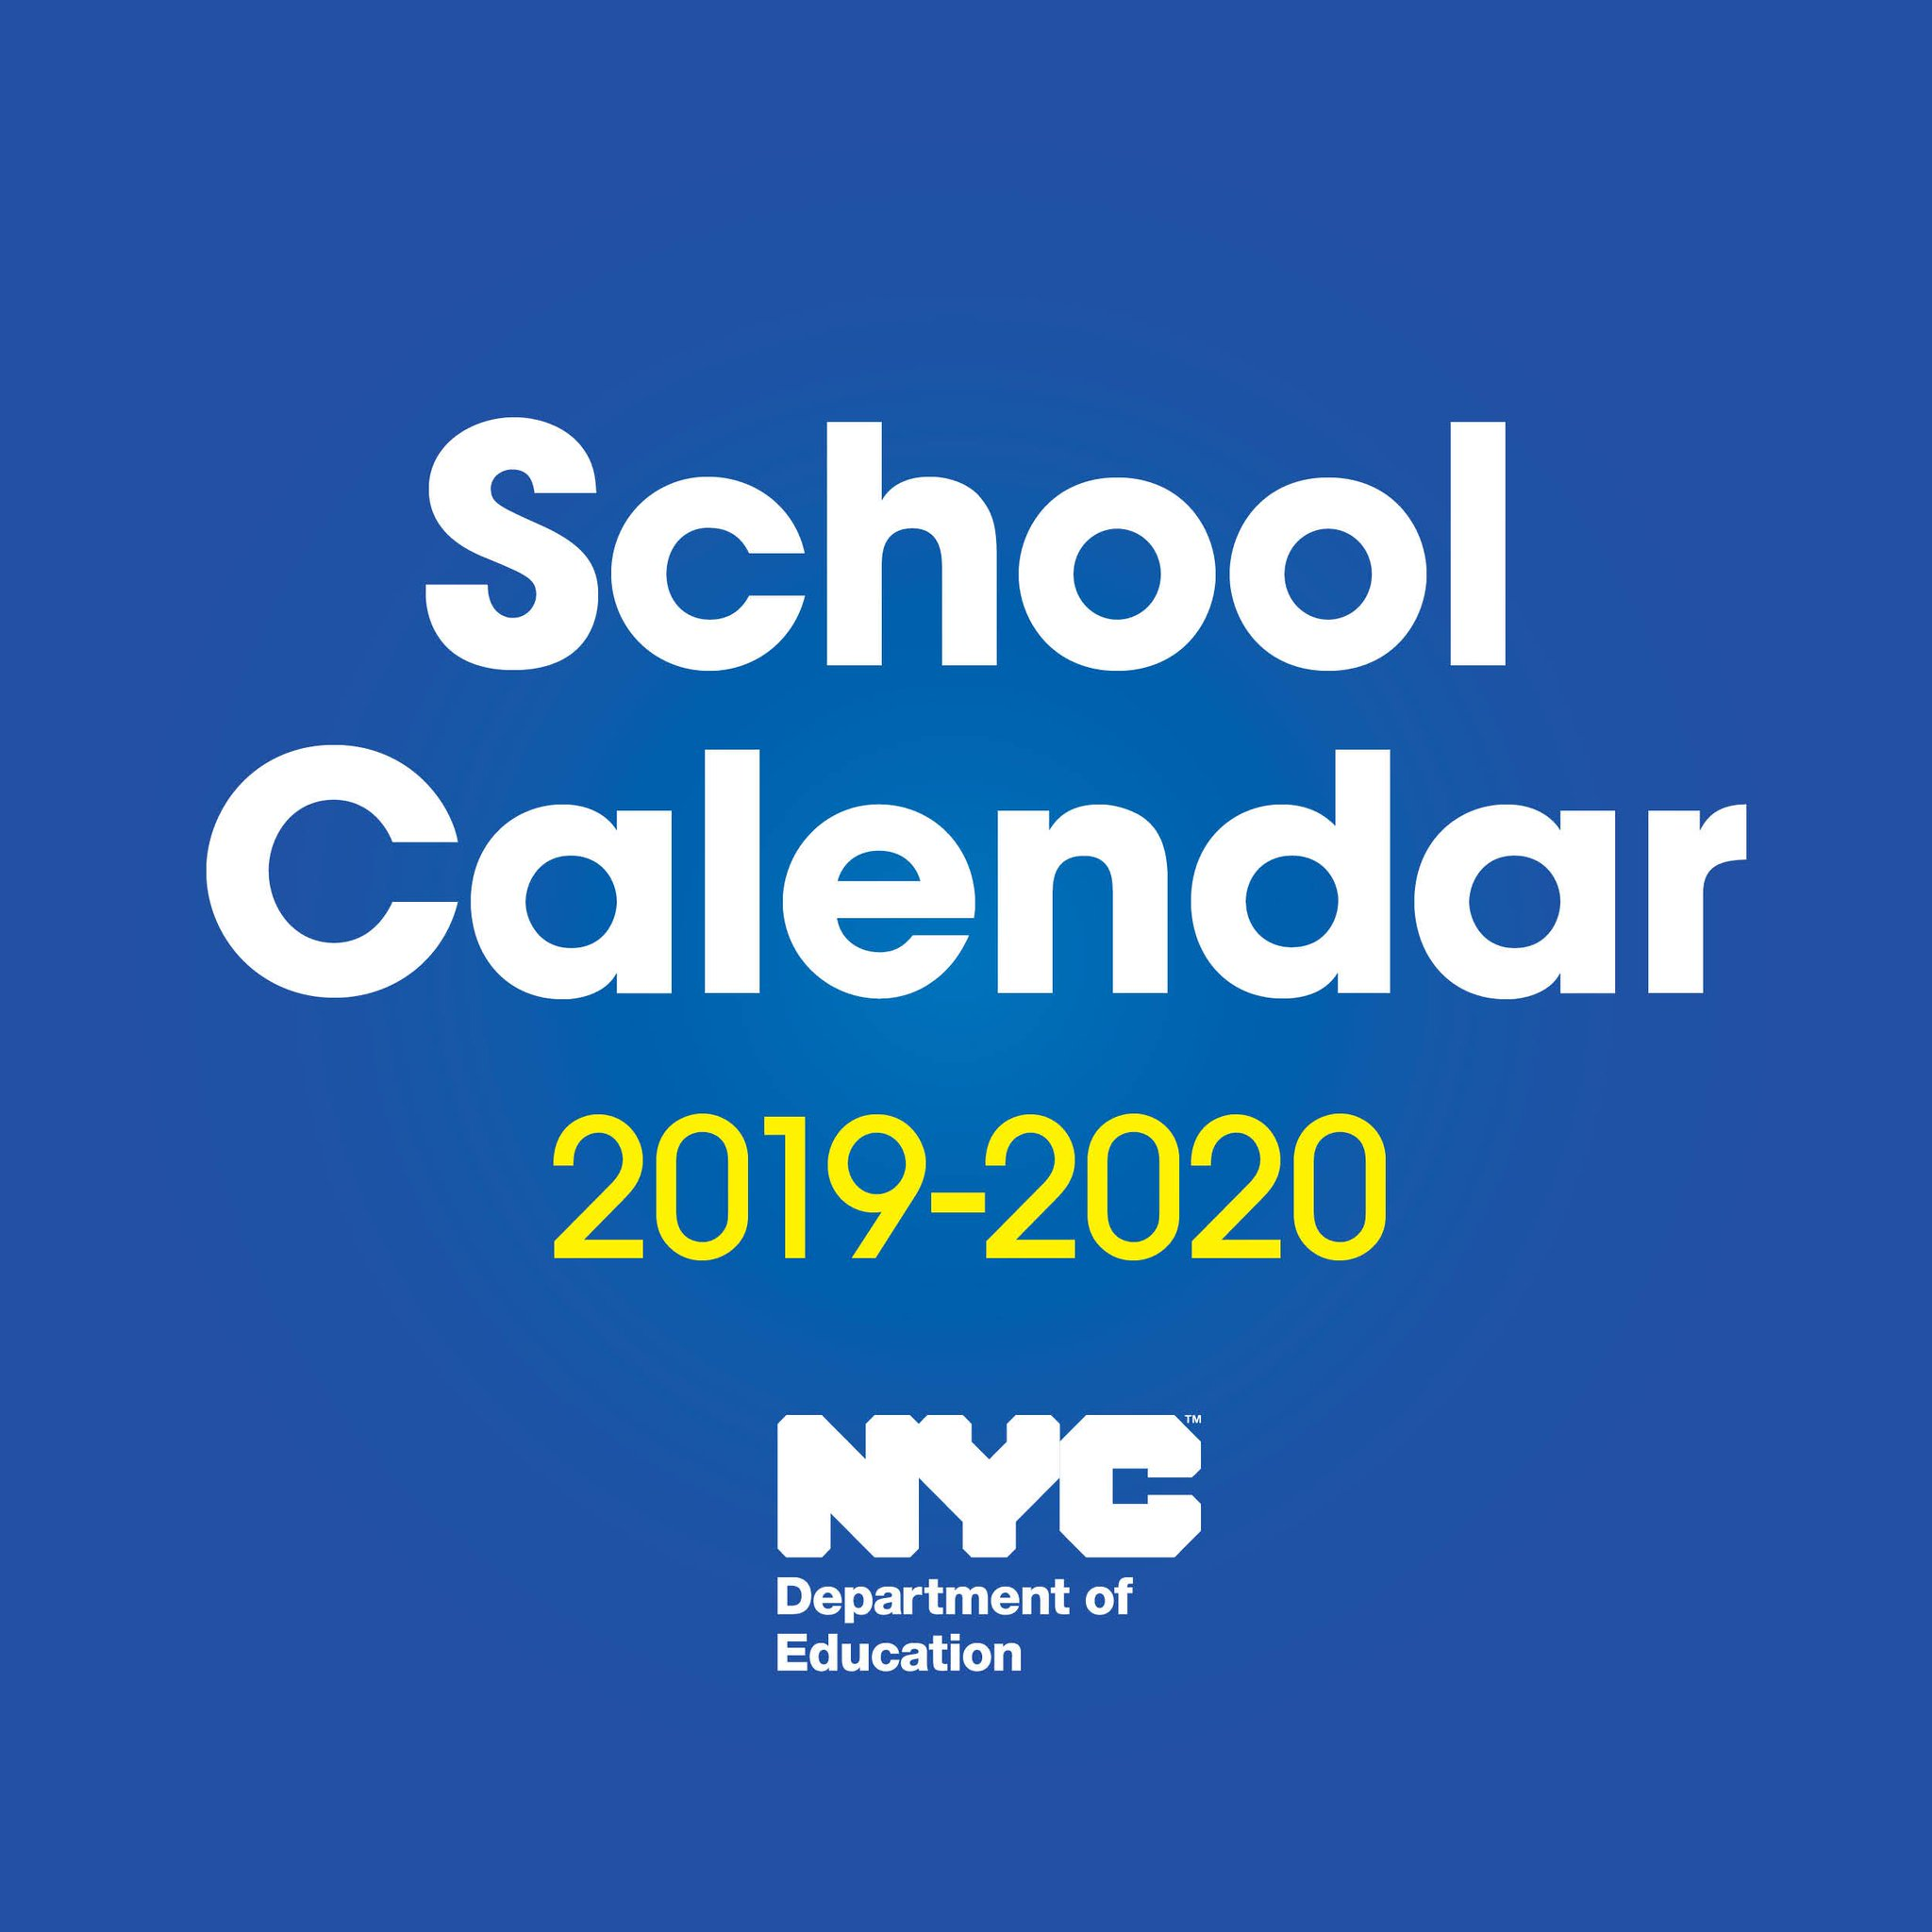 Nyc December 2020 Calendar NYC Public Schools on Twitter: